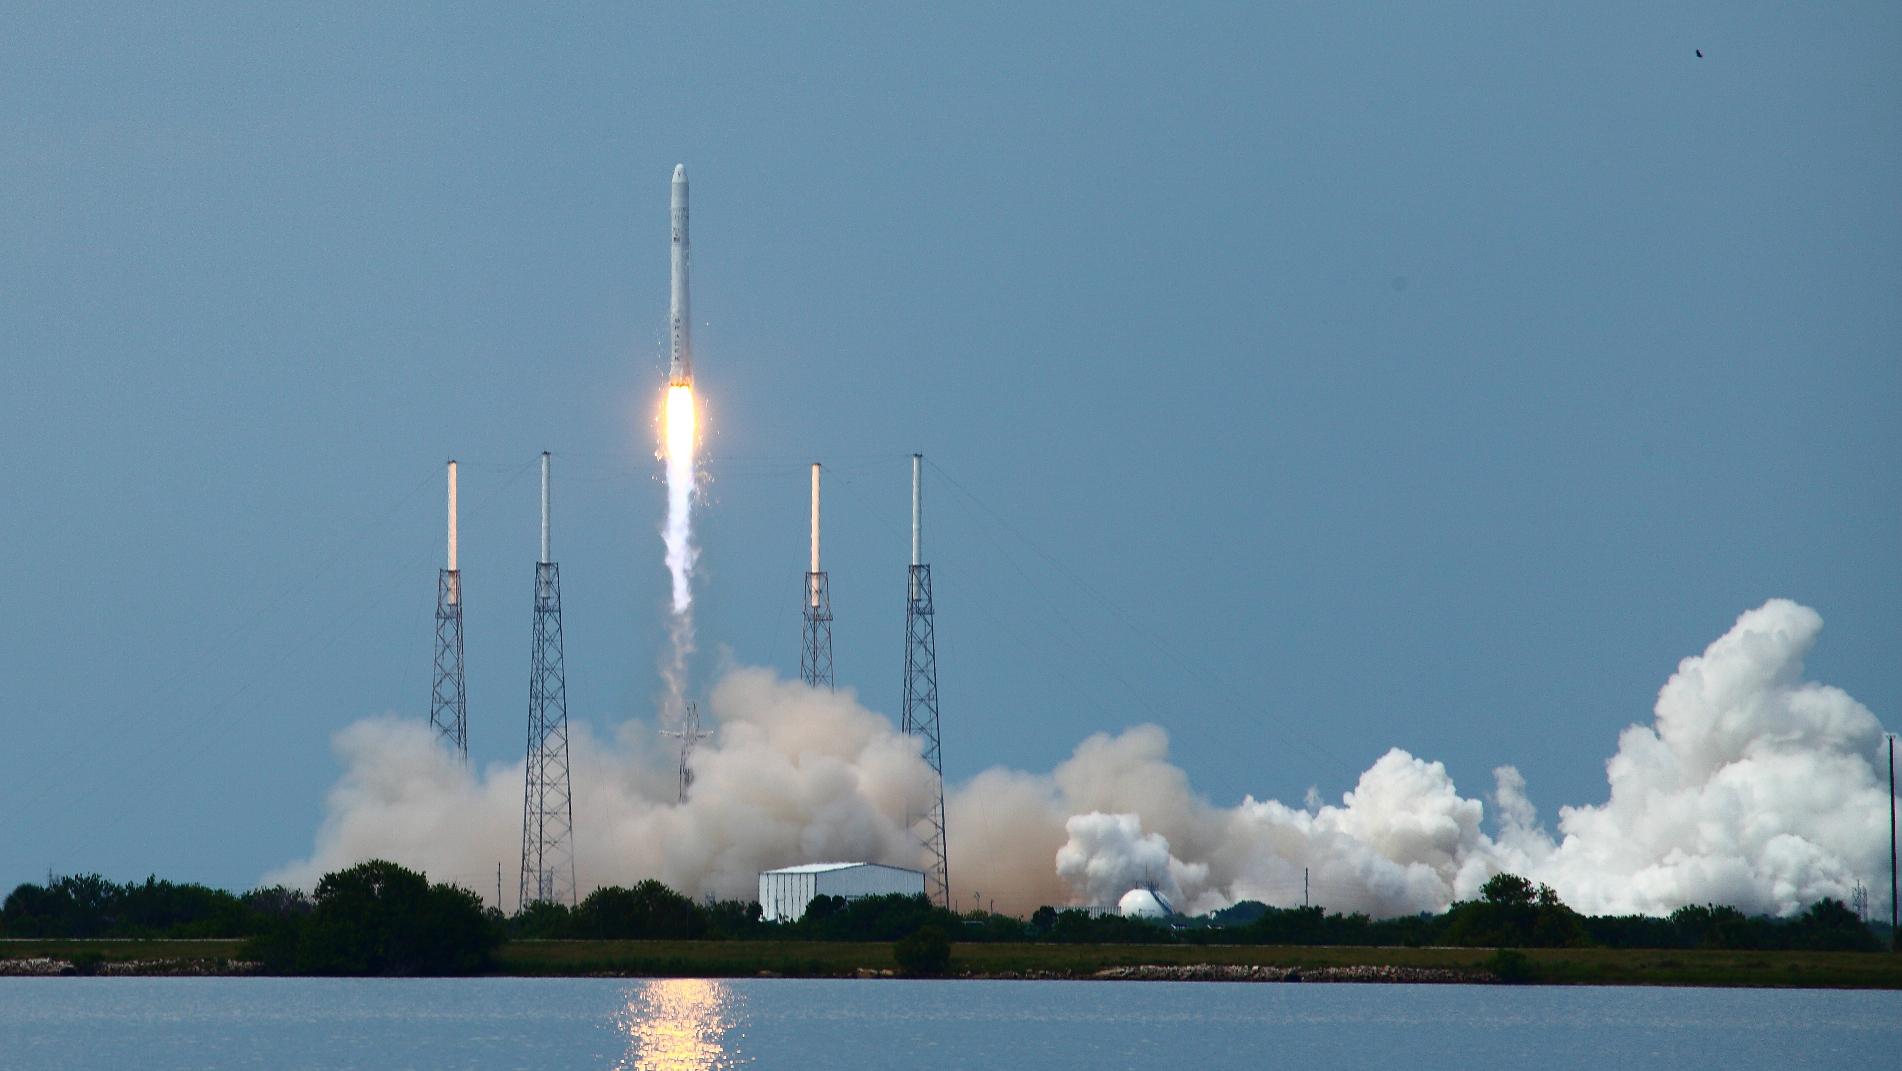 space x google cape canaveral launch falcon 9 elon musk 11